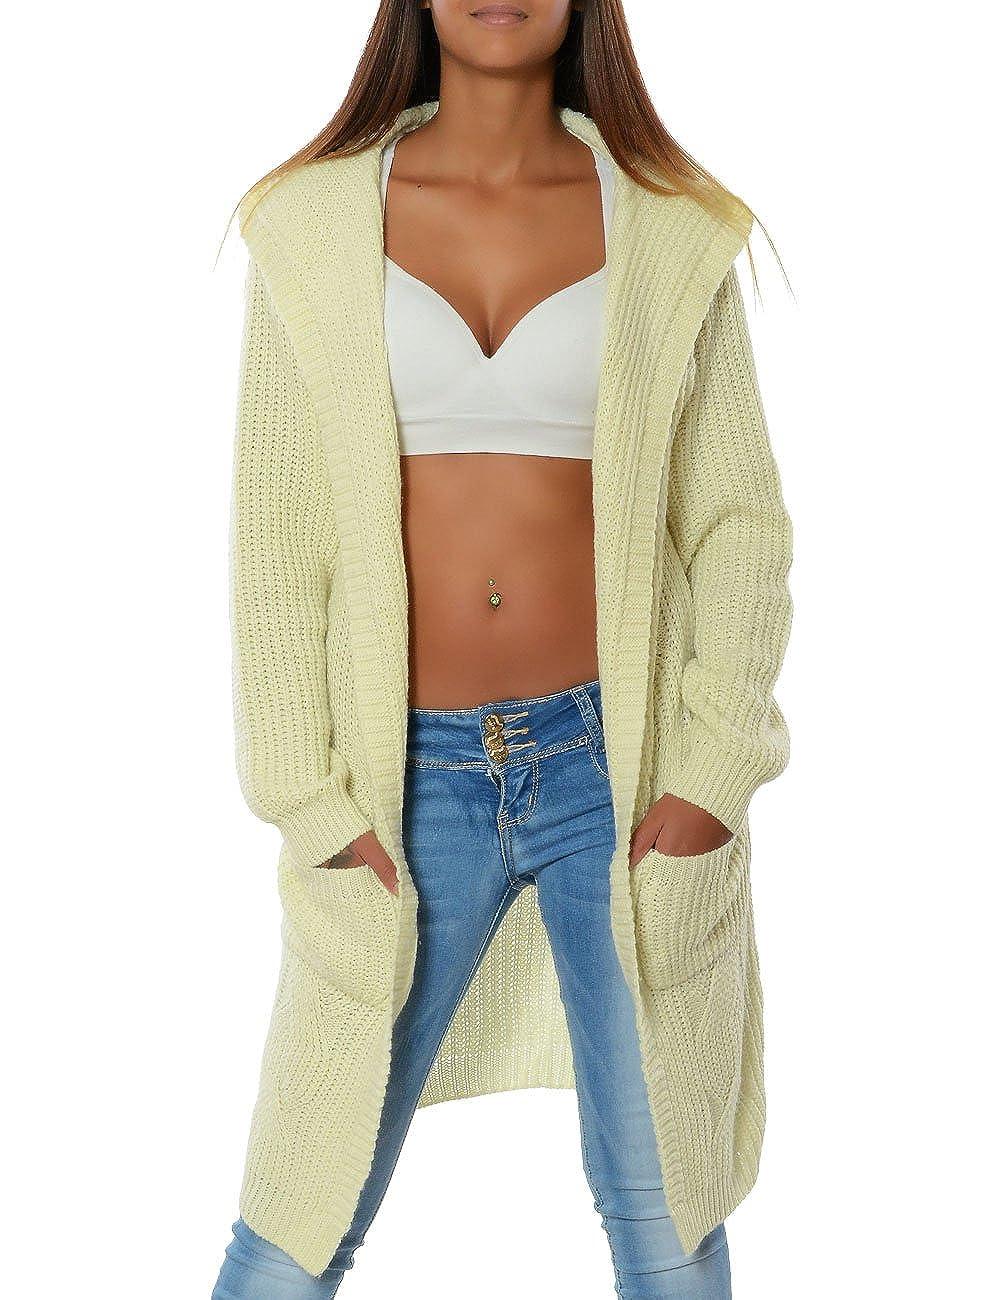 FrauenStrick Jacke Mantel Pullover Strickpullover mit Kapuze Strickjacke Sweater